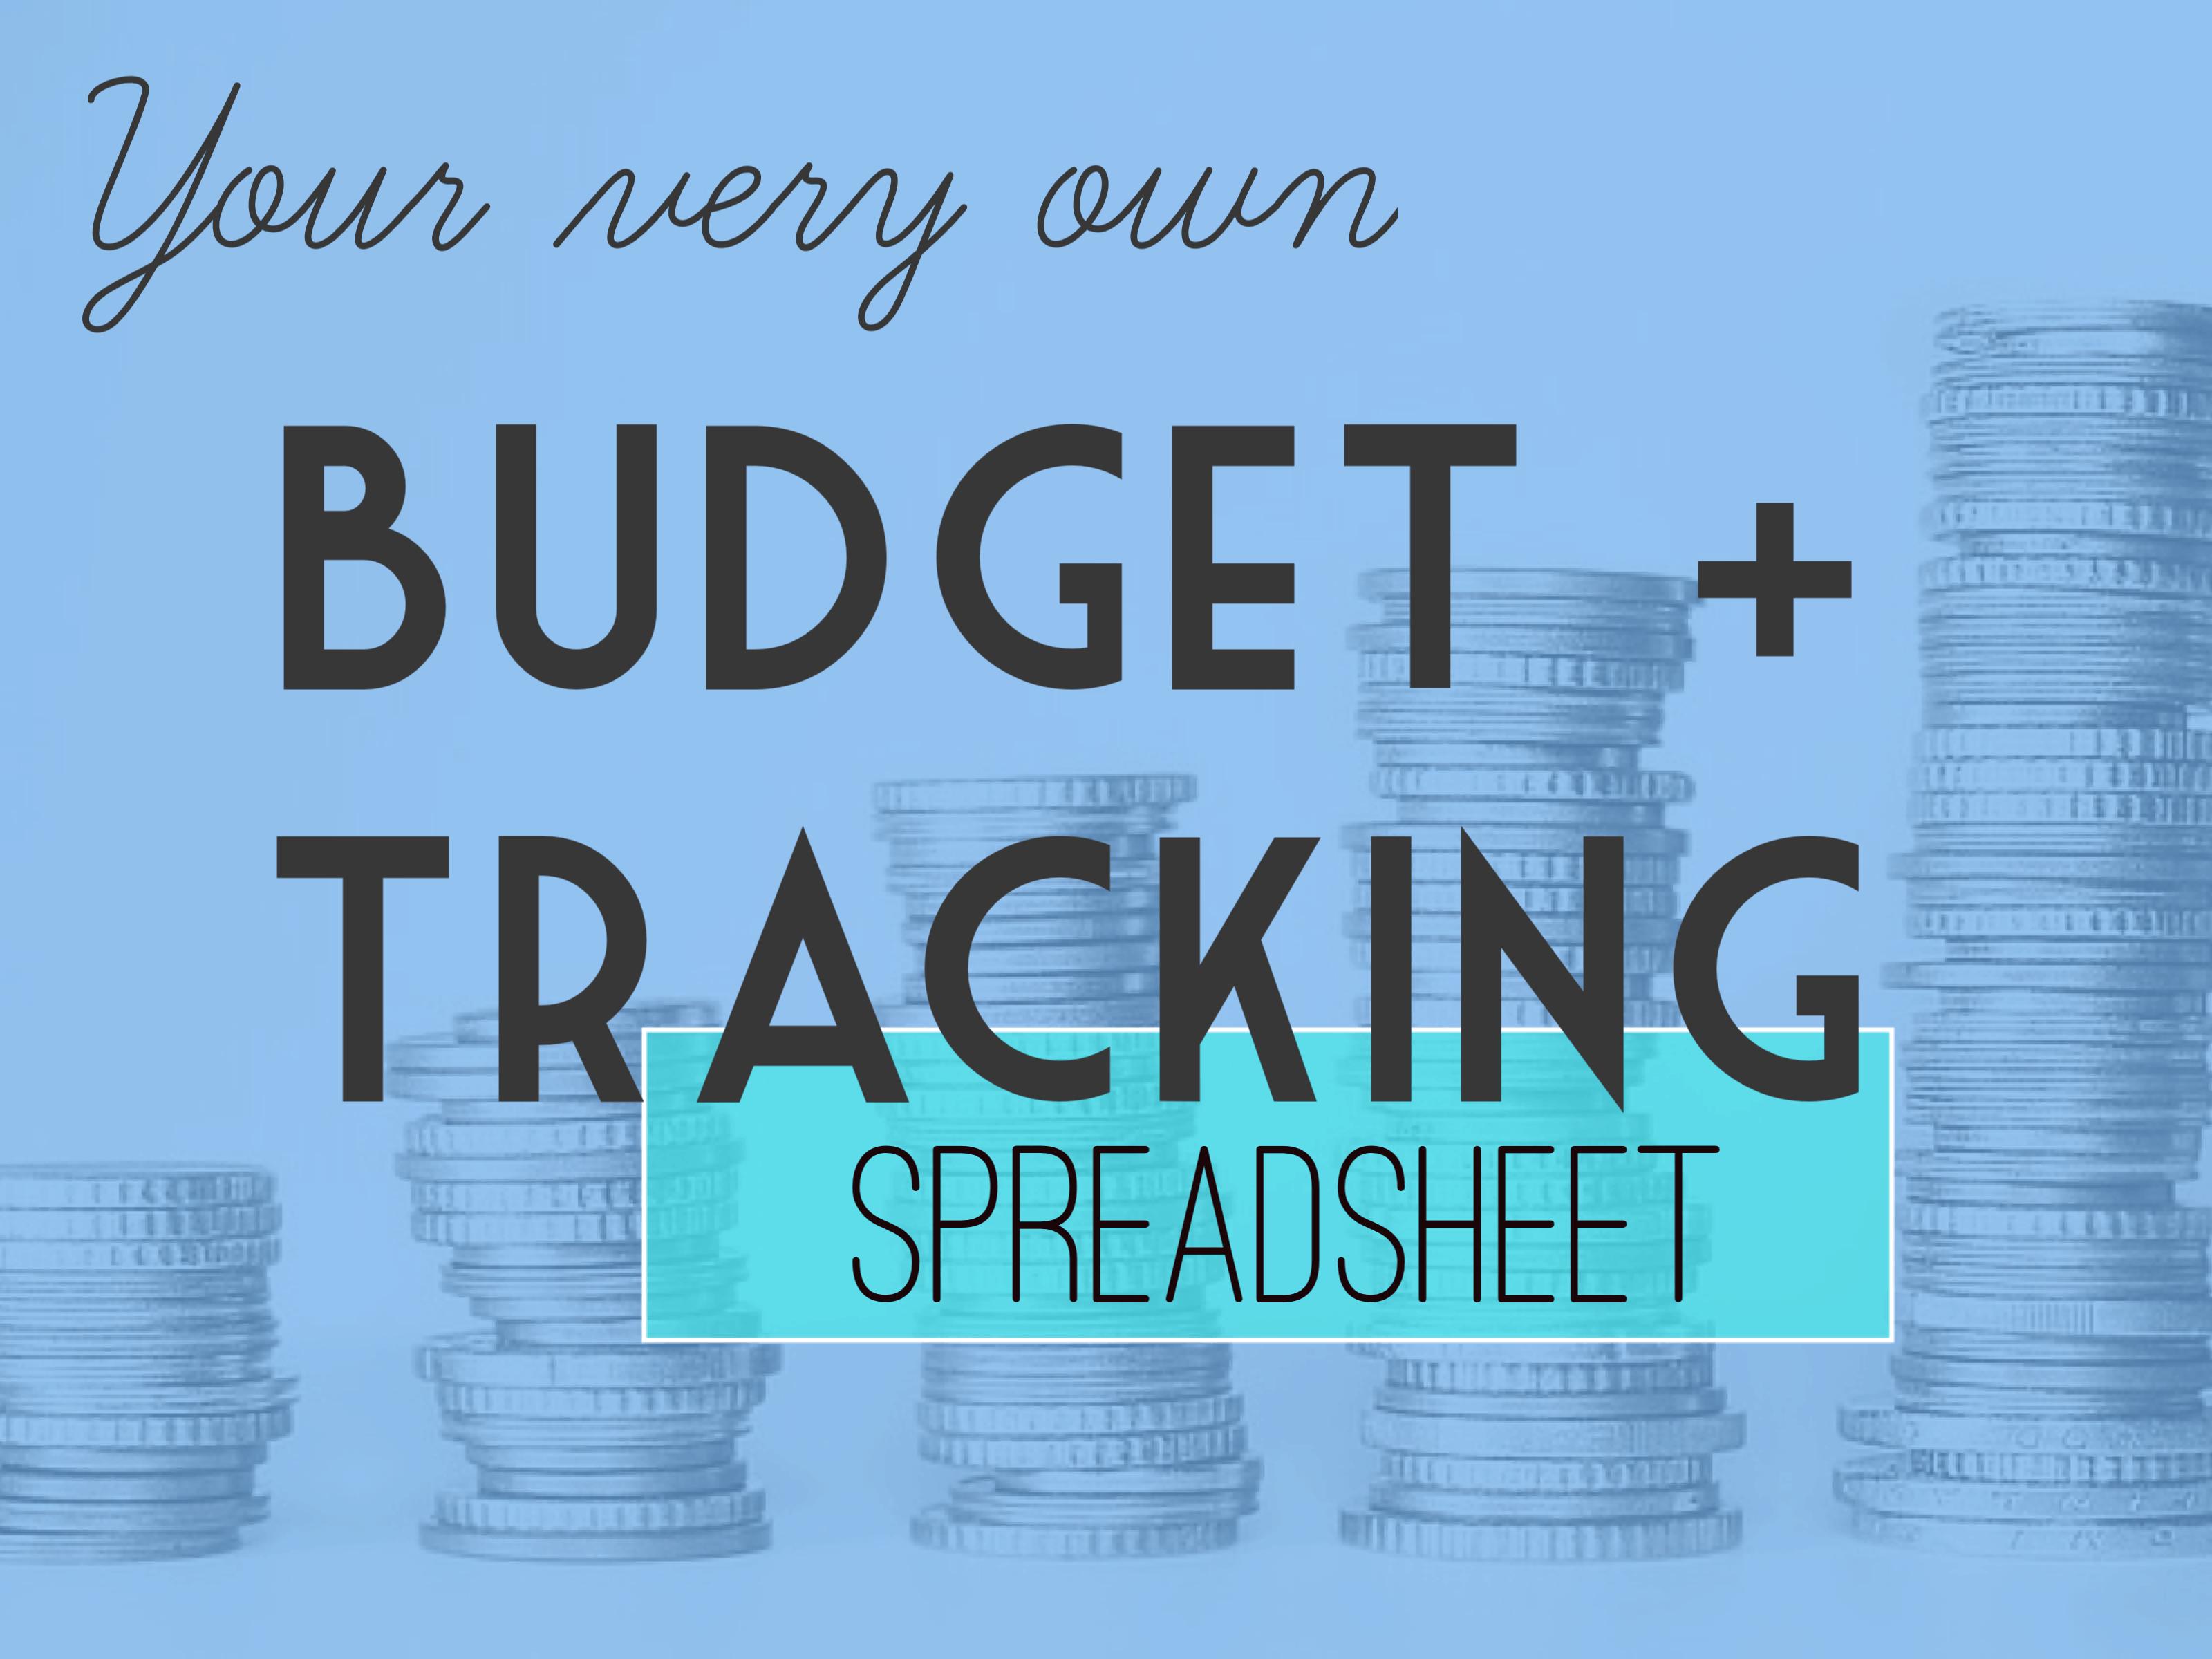 Budget Tracking Spreadsheet